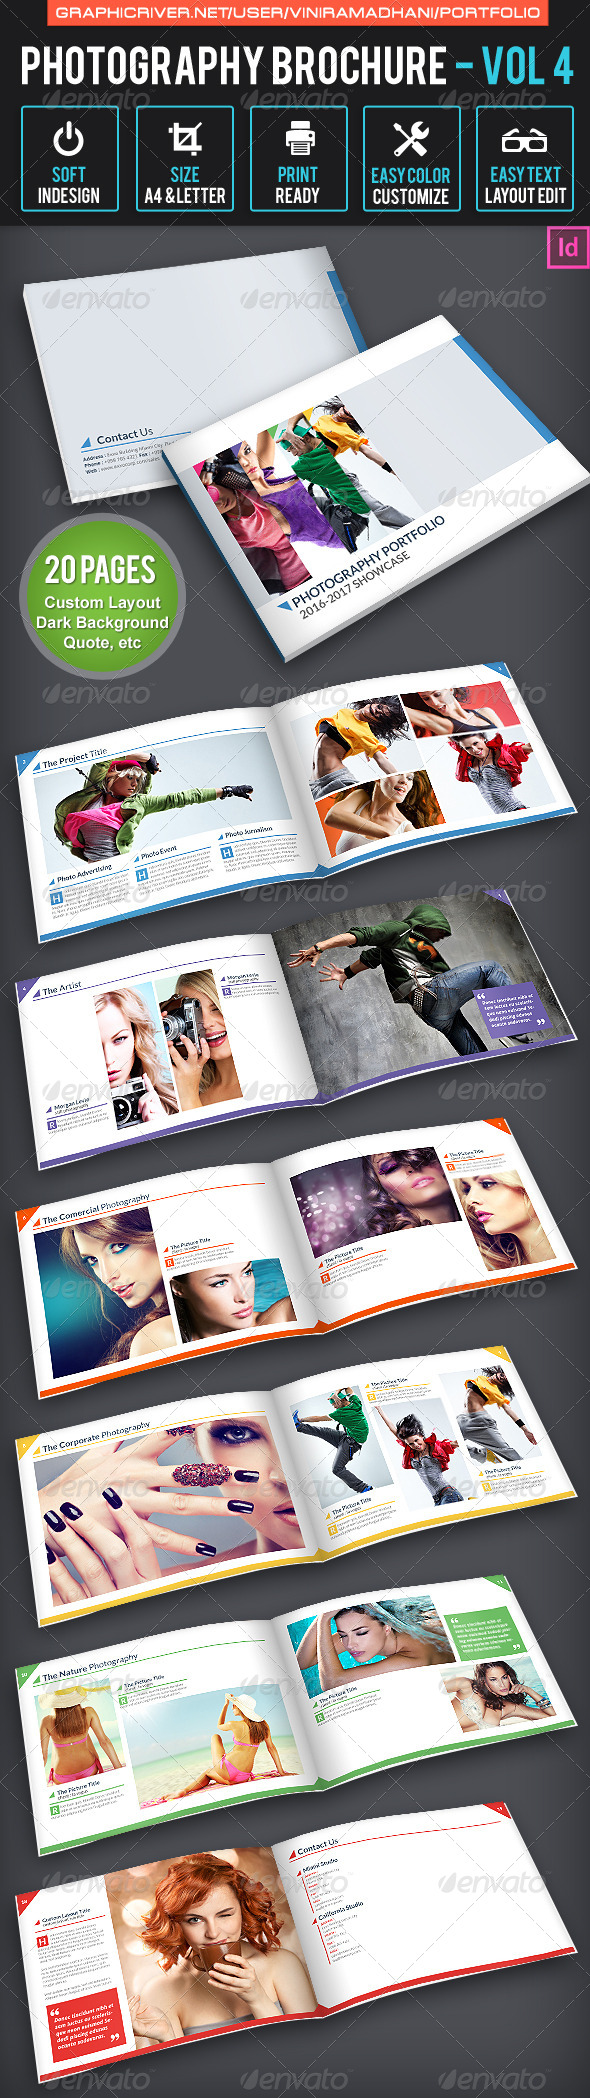 Photography Brochure | Volume 4 - Portfolio Brochures